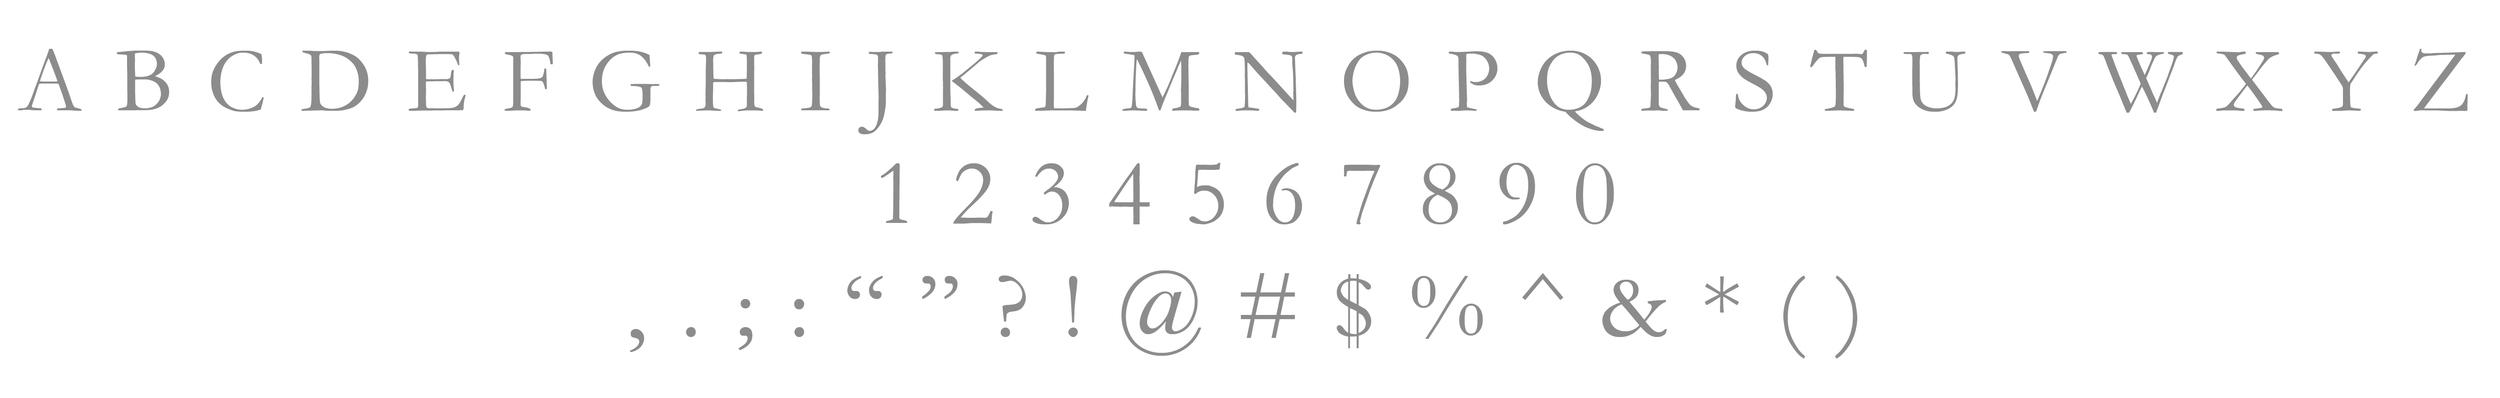 Primary Typeface / Adobe Garamond Pro